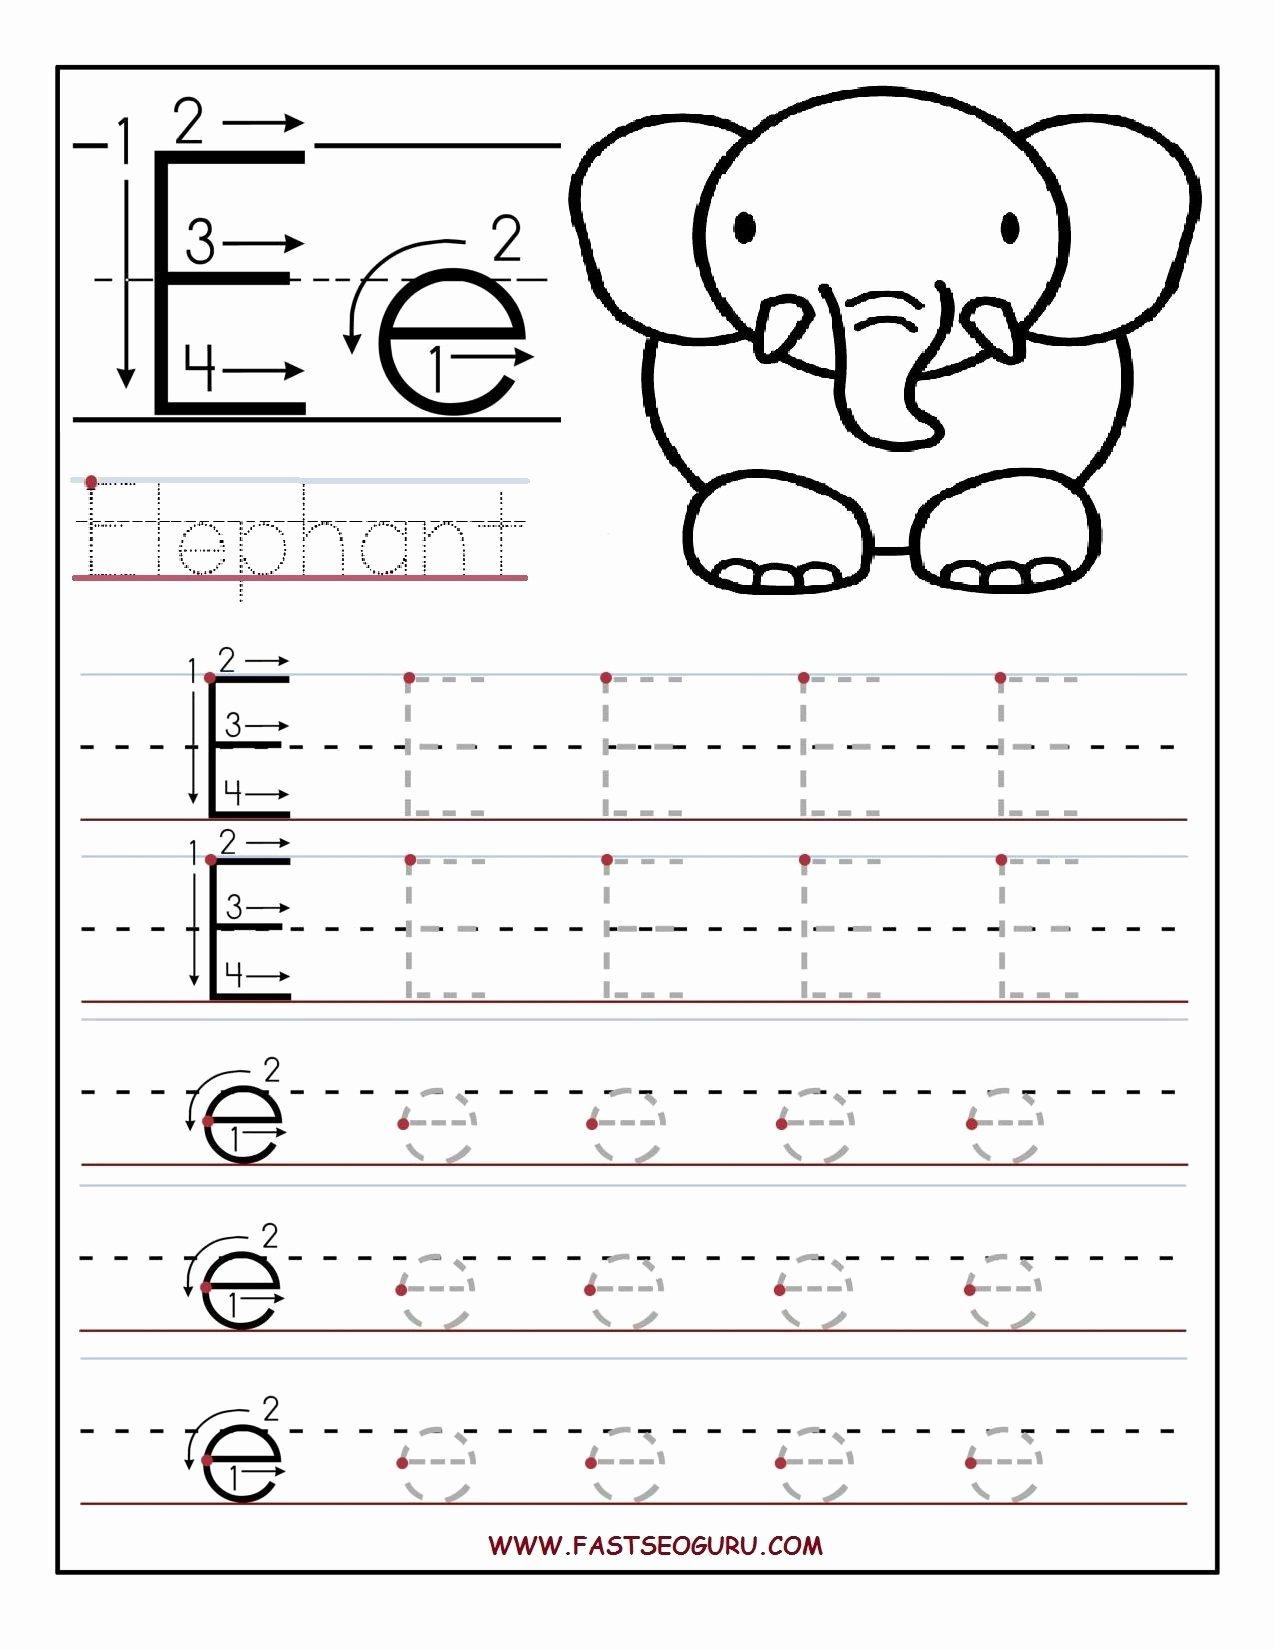 Free Printable Letter E Worksheets for Preschoolers Kids Letter E Worksheets S Newpcairport